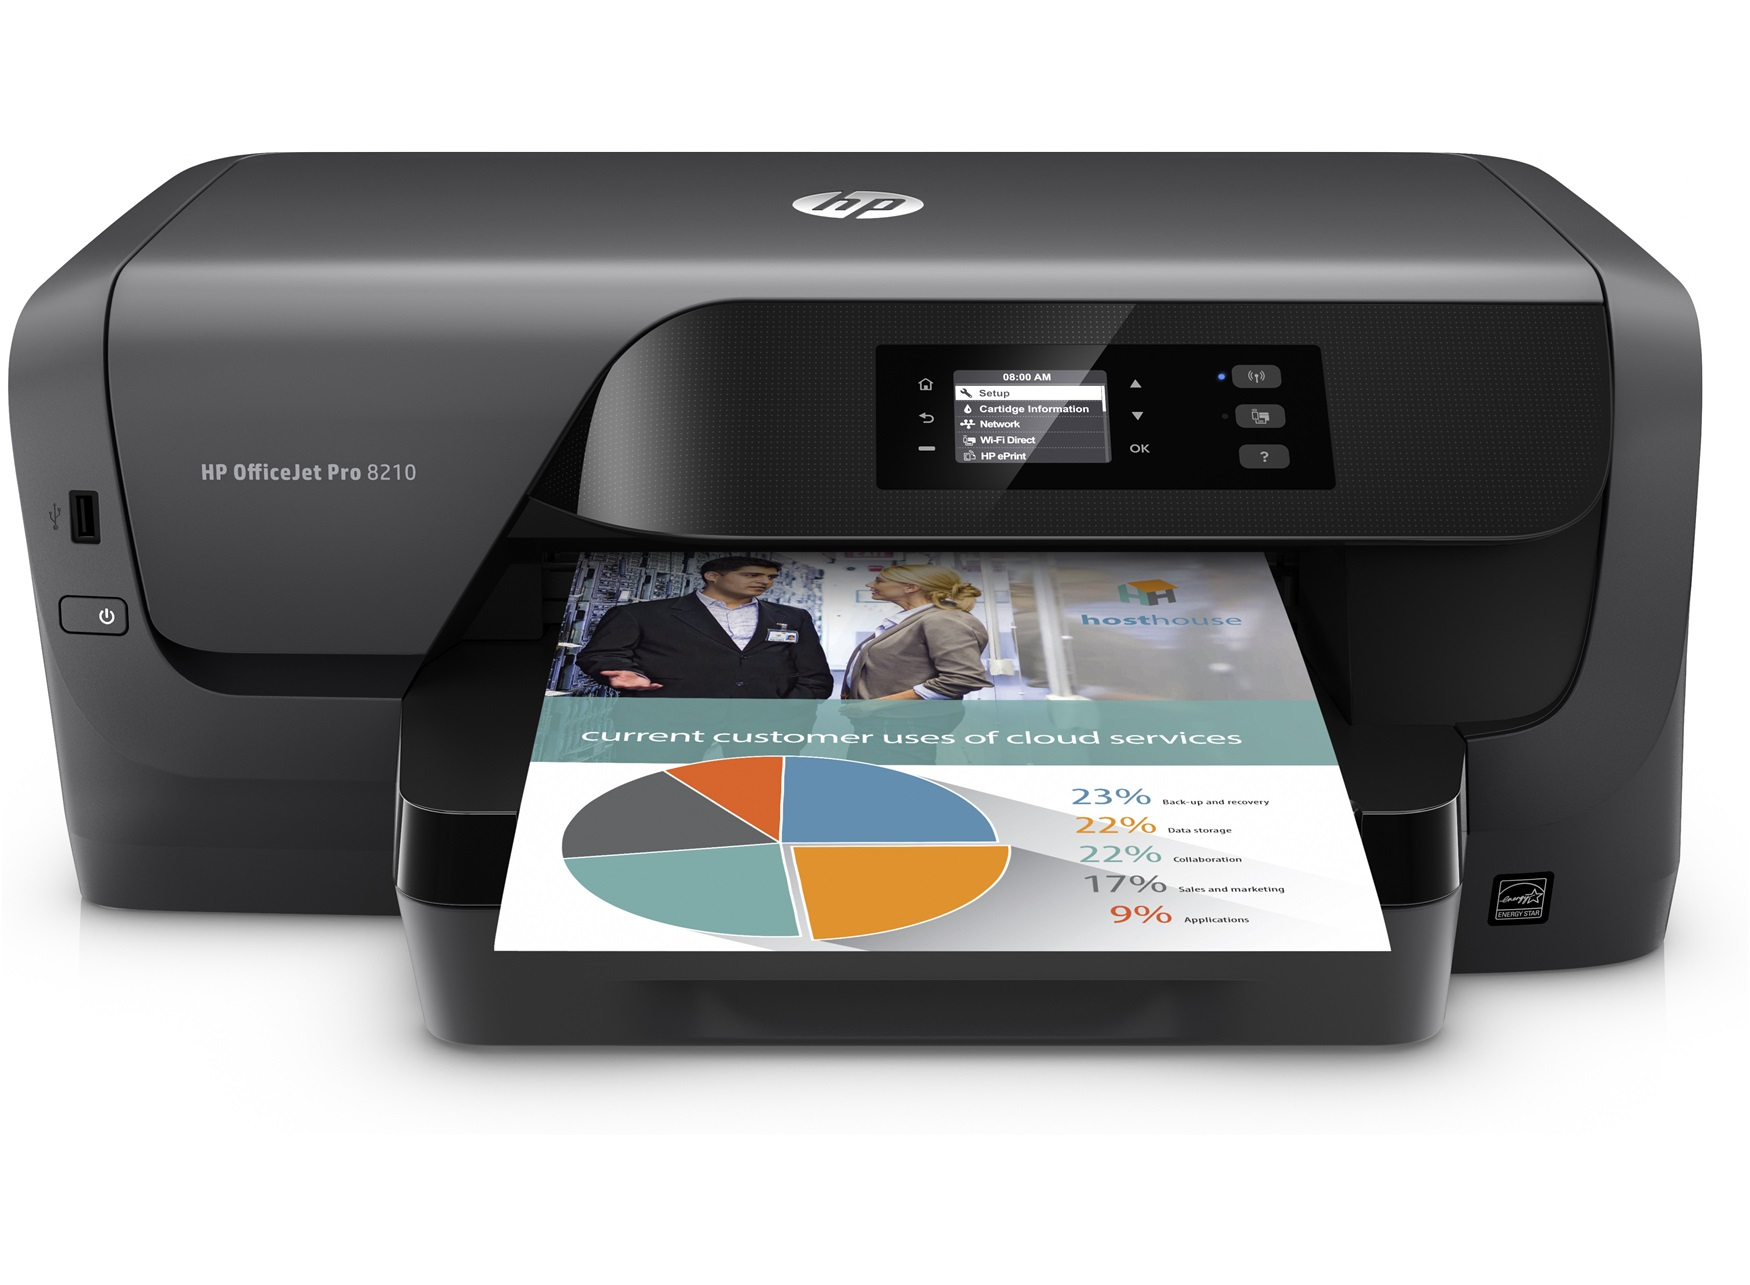 hp officejet pro 8210 colour 2400 x 1200dpi a4 wi fi inkjet printer. Black Bedroom Furniture Sets. Home Design Ideas